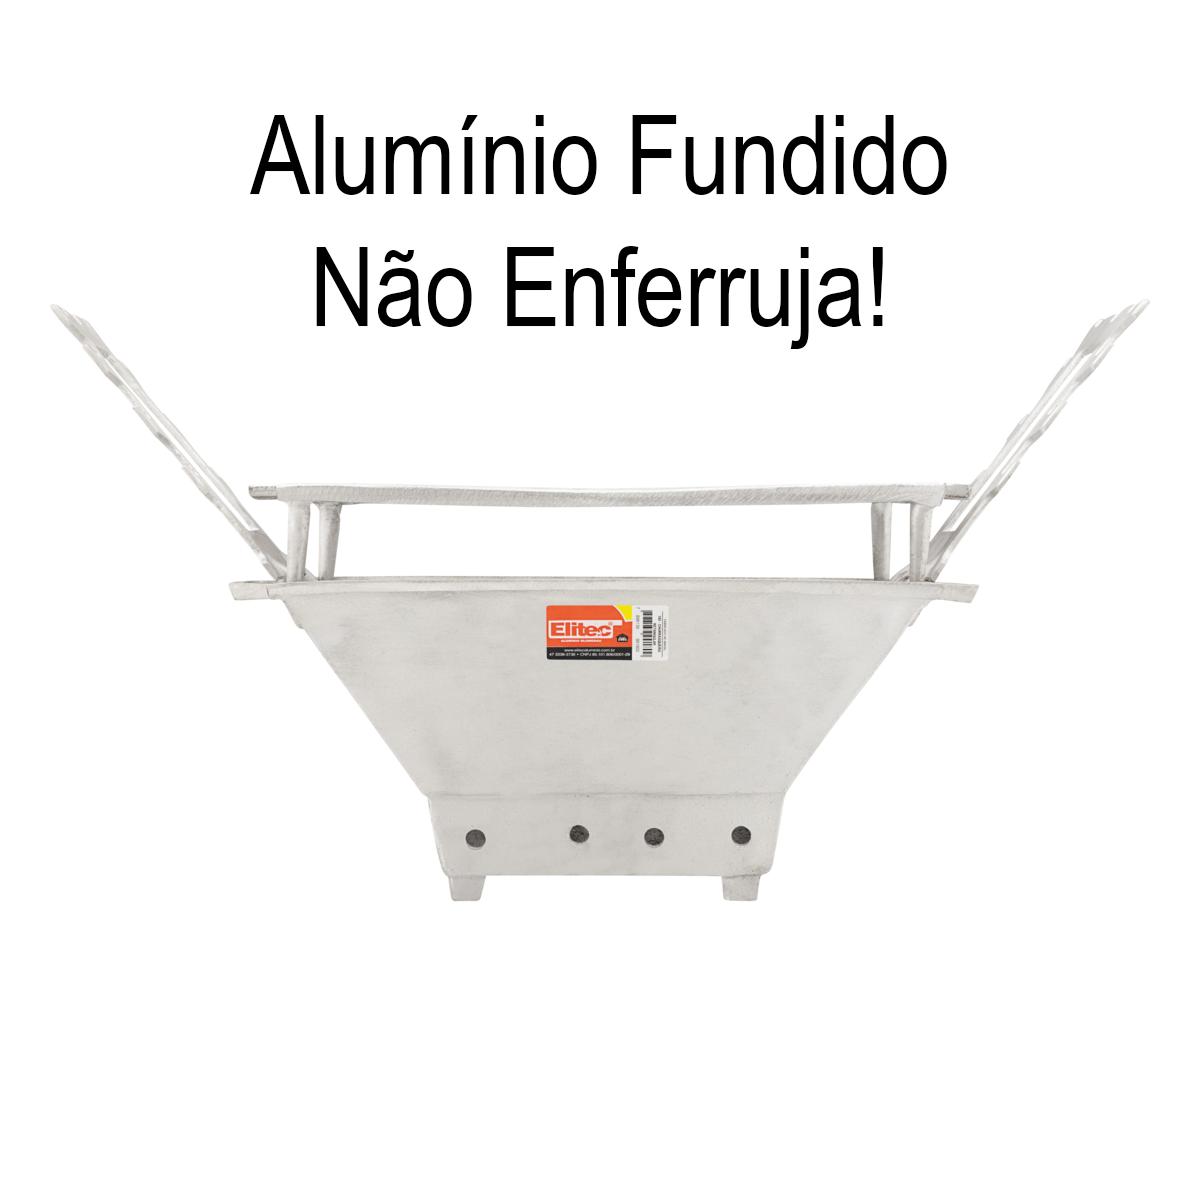 Churrasqueira Retangular Aluminio Fundido 45x32 Elitec